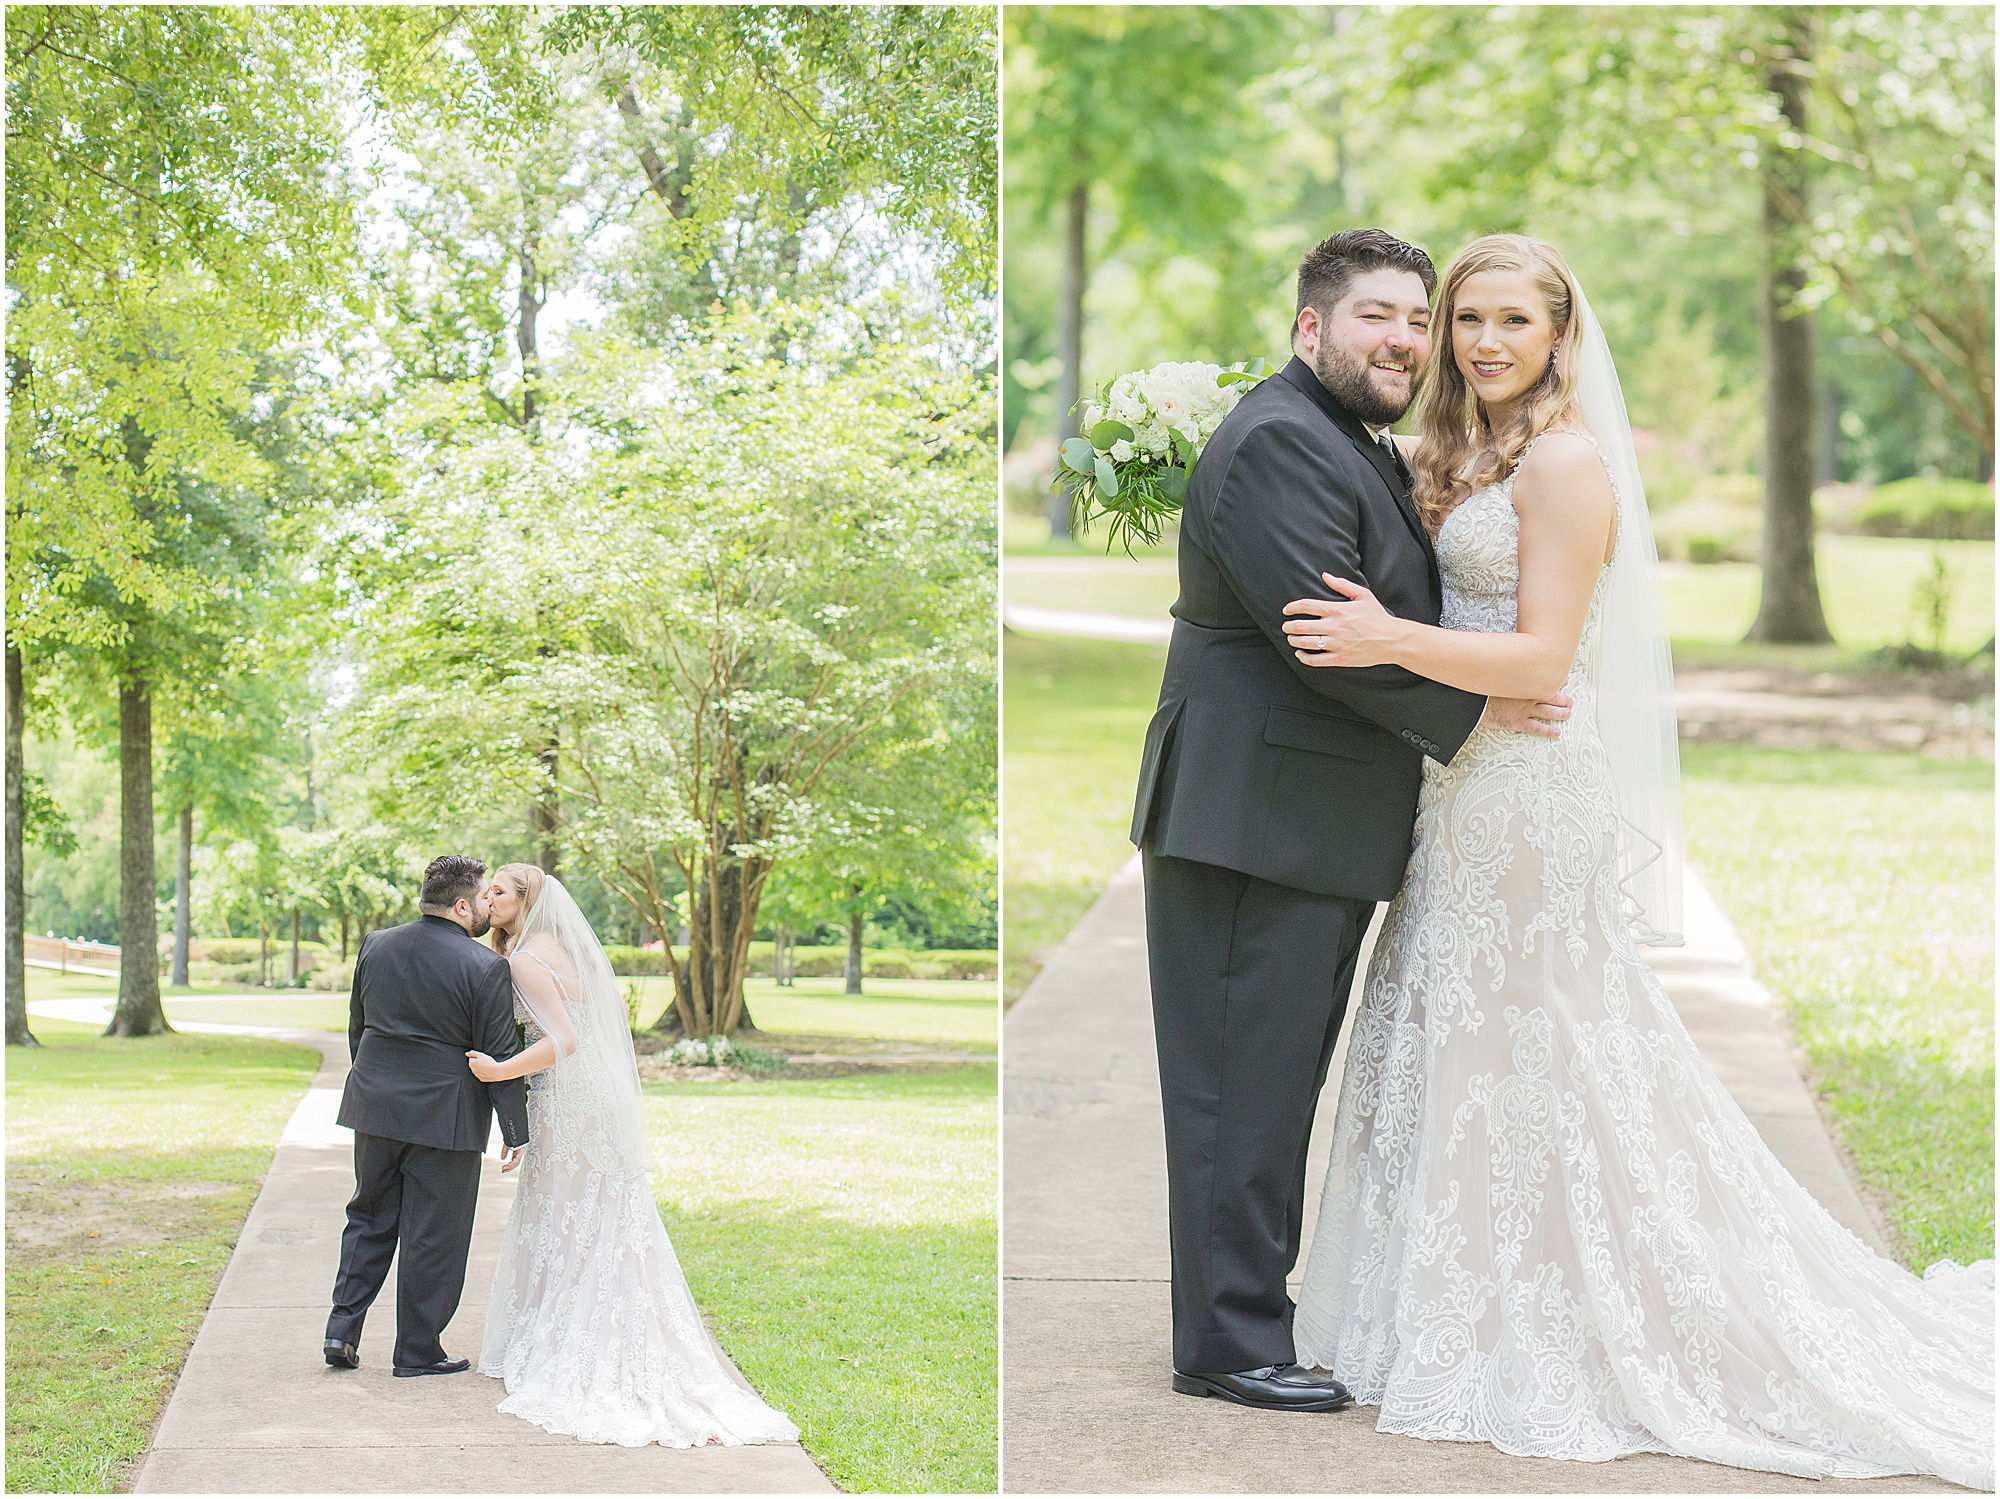 mississippi-summer-wedding-mcclain-lodge_0025.jpg